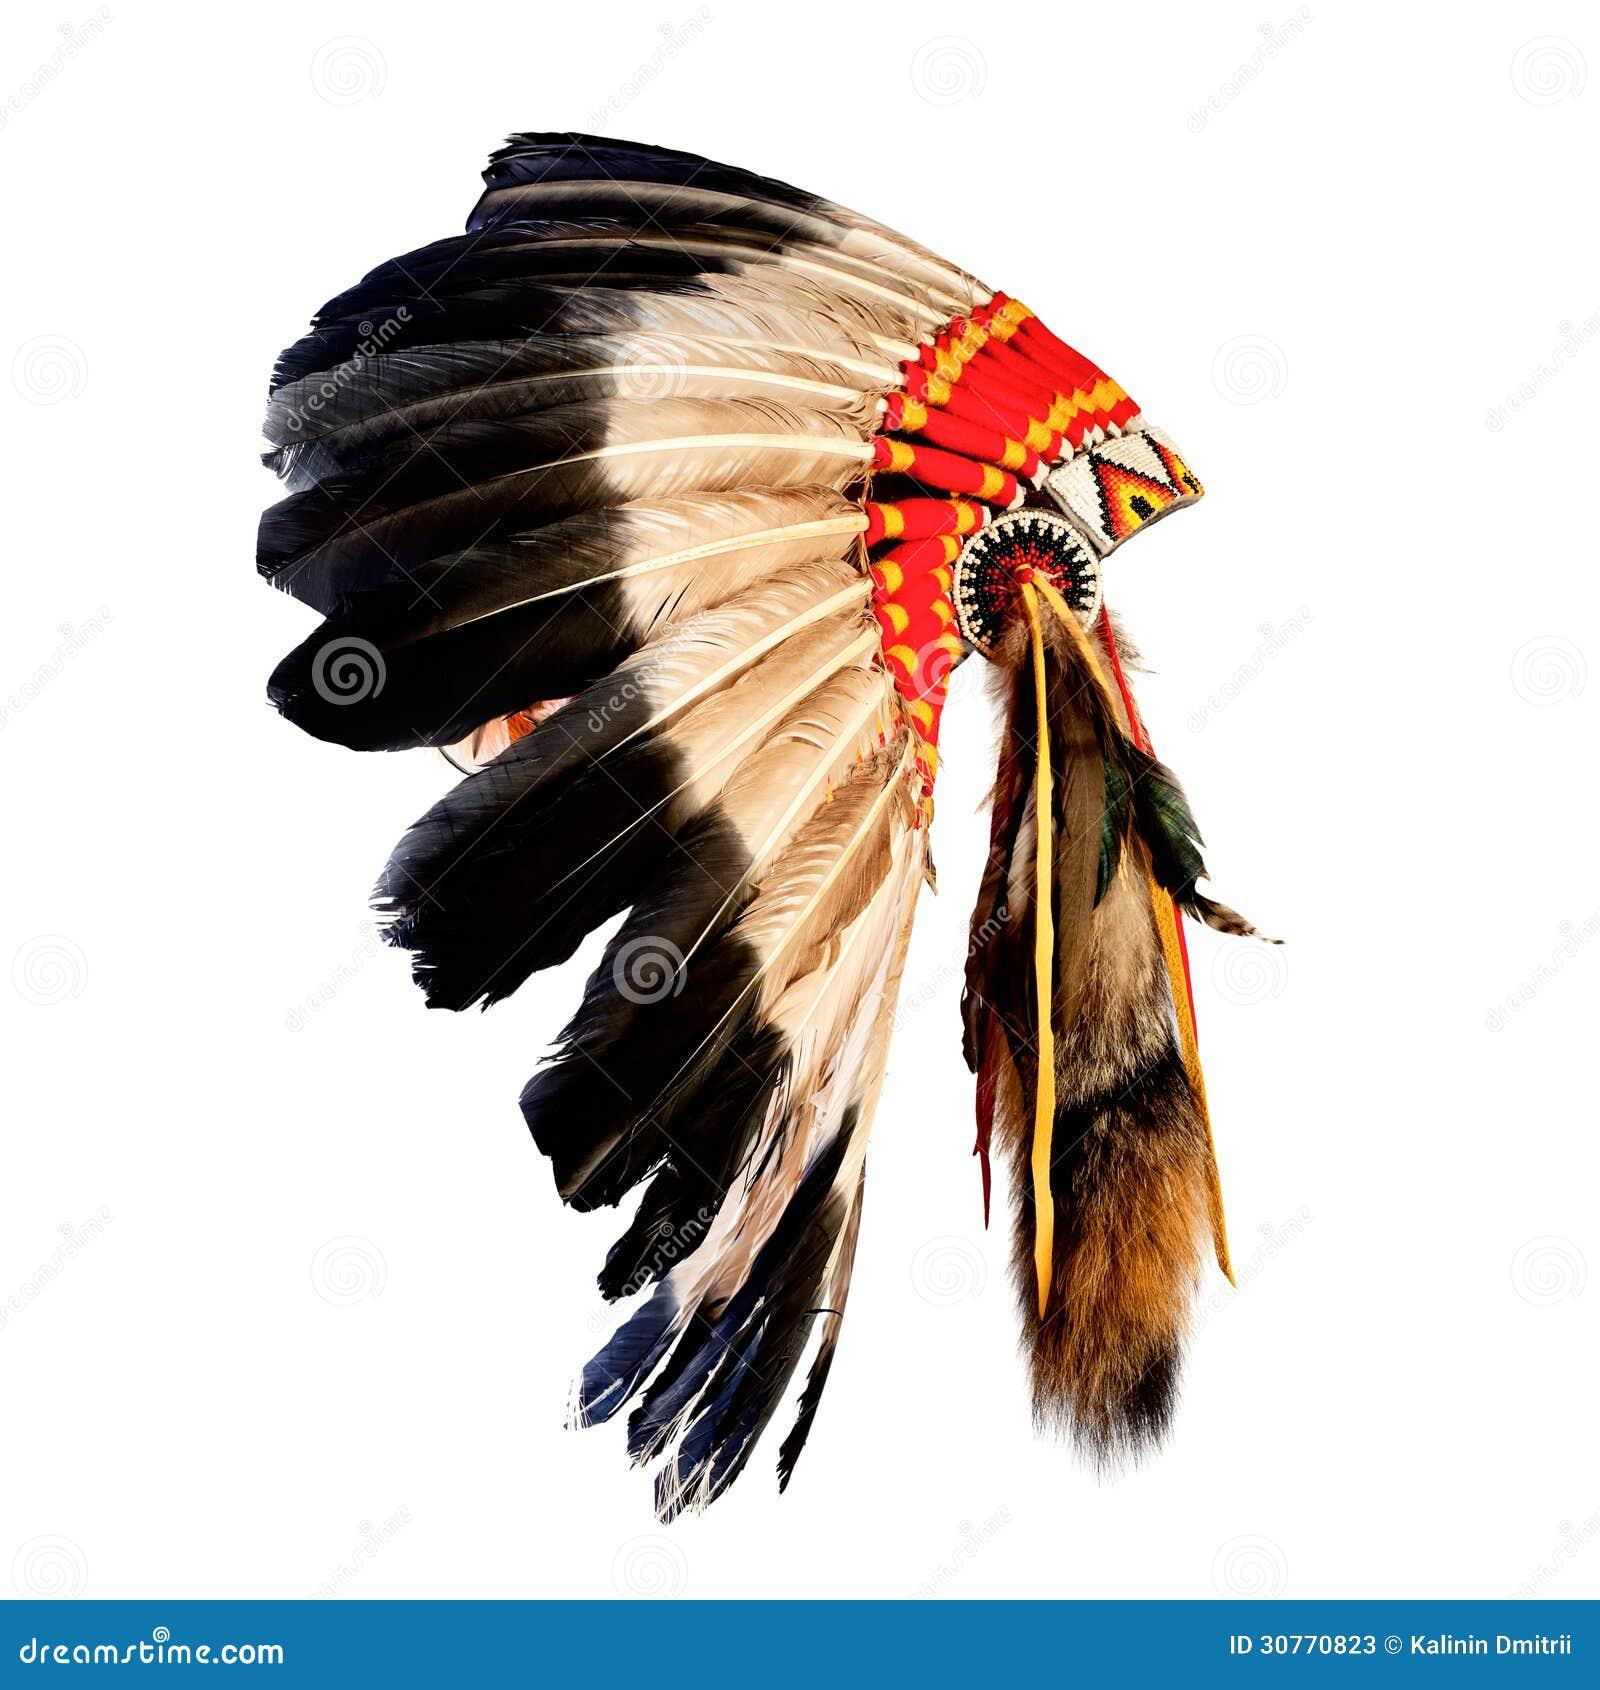 Native American Indian Chief Headdress Stock Image - Image